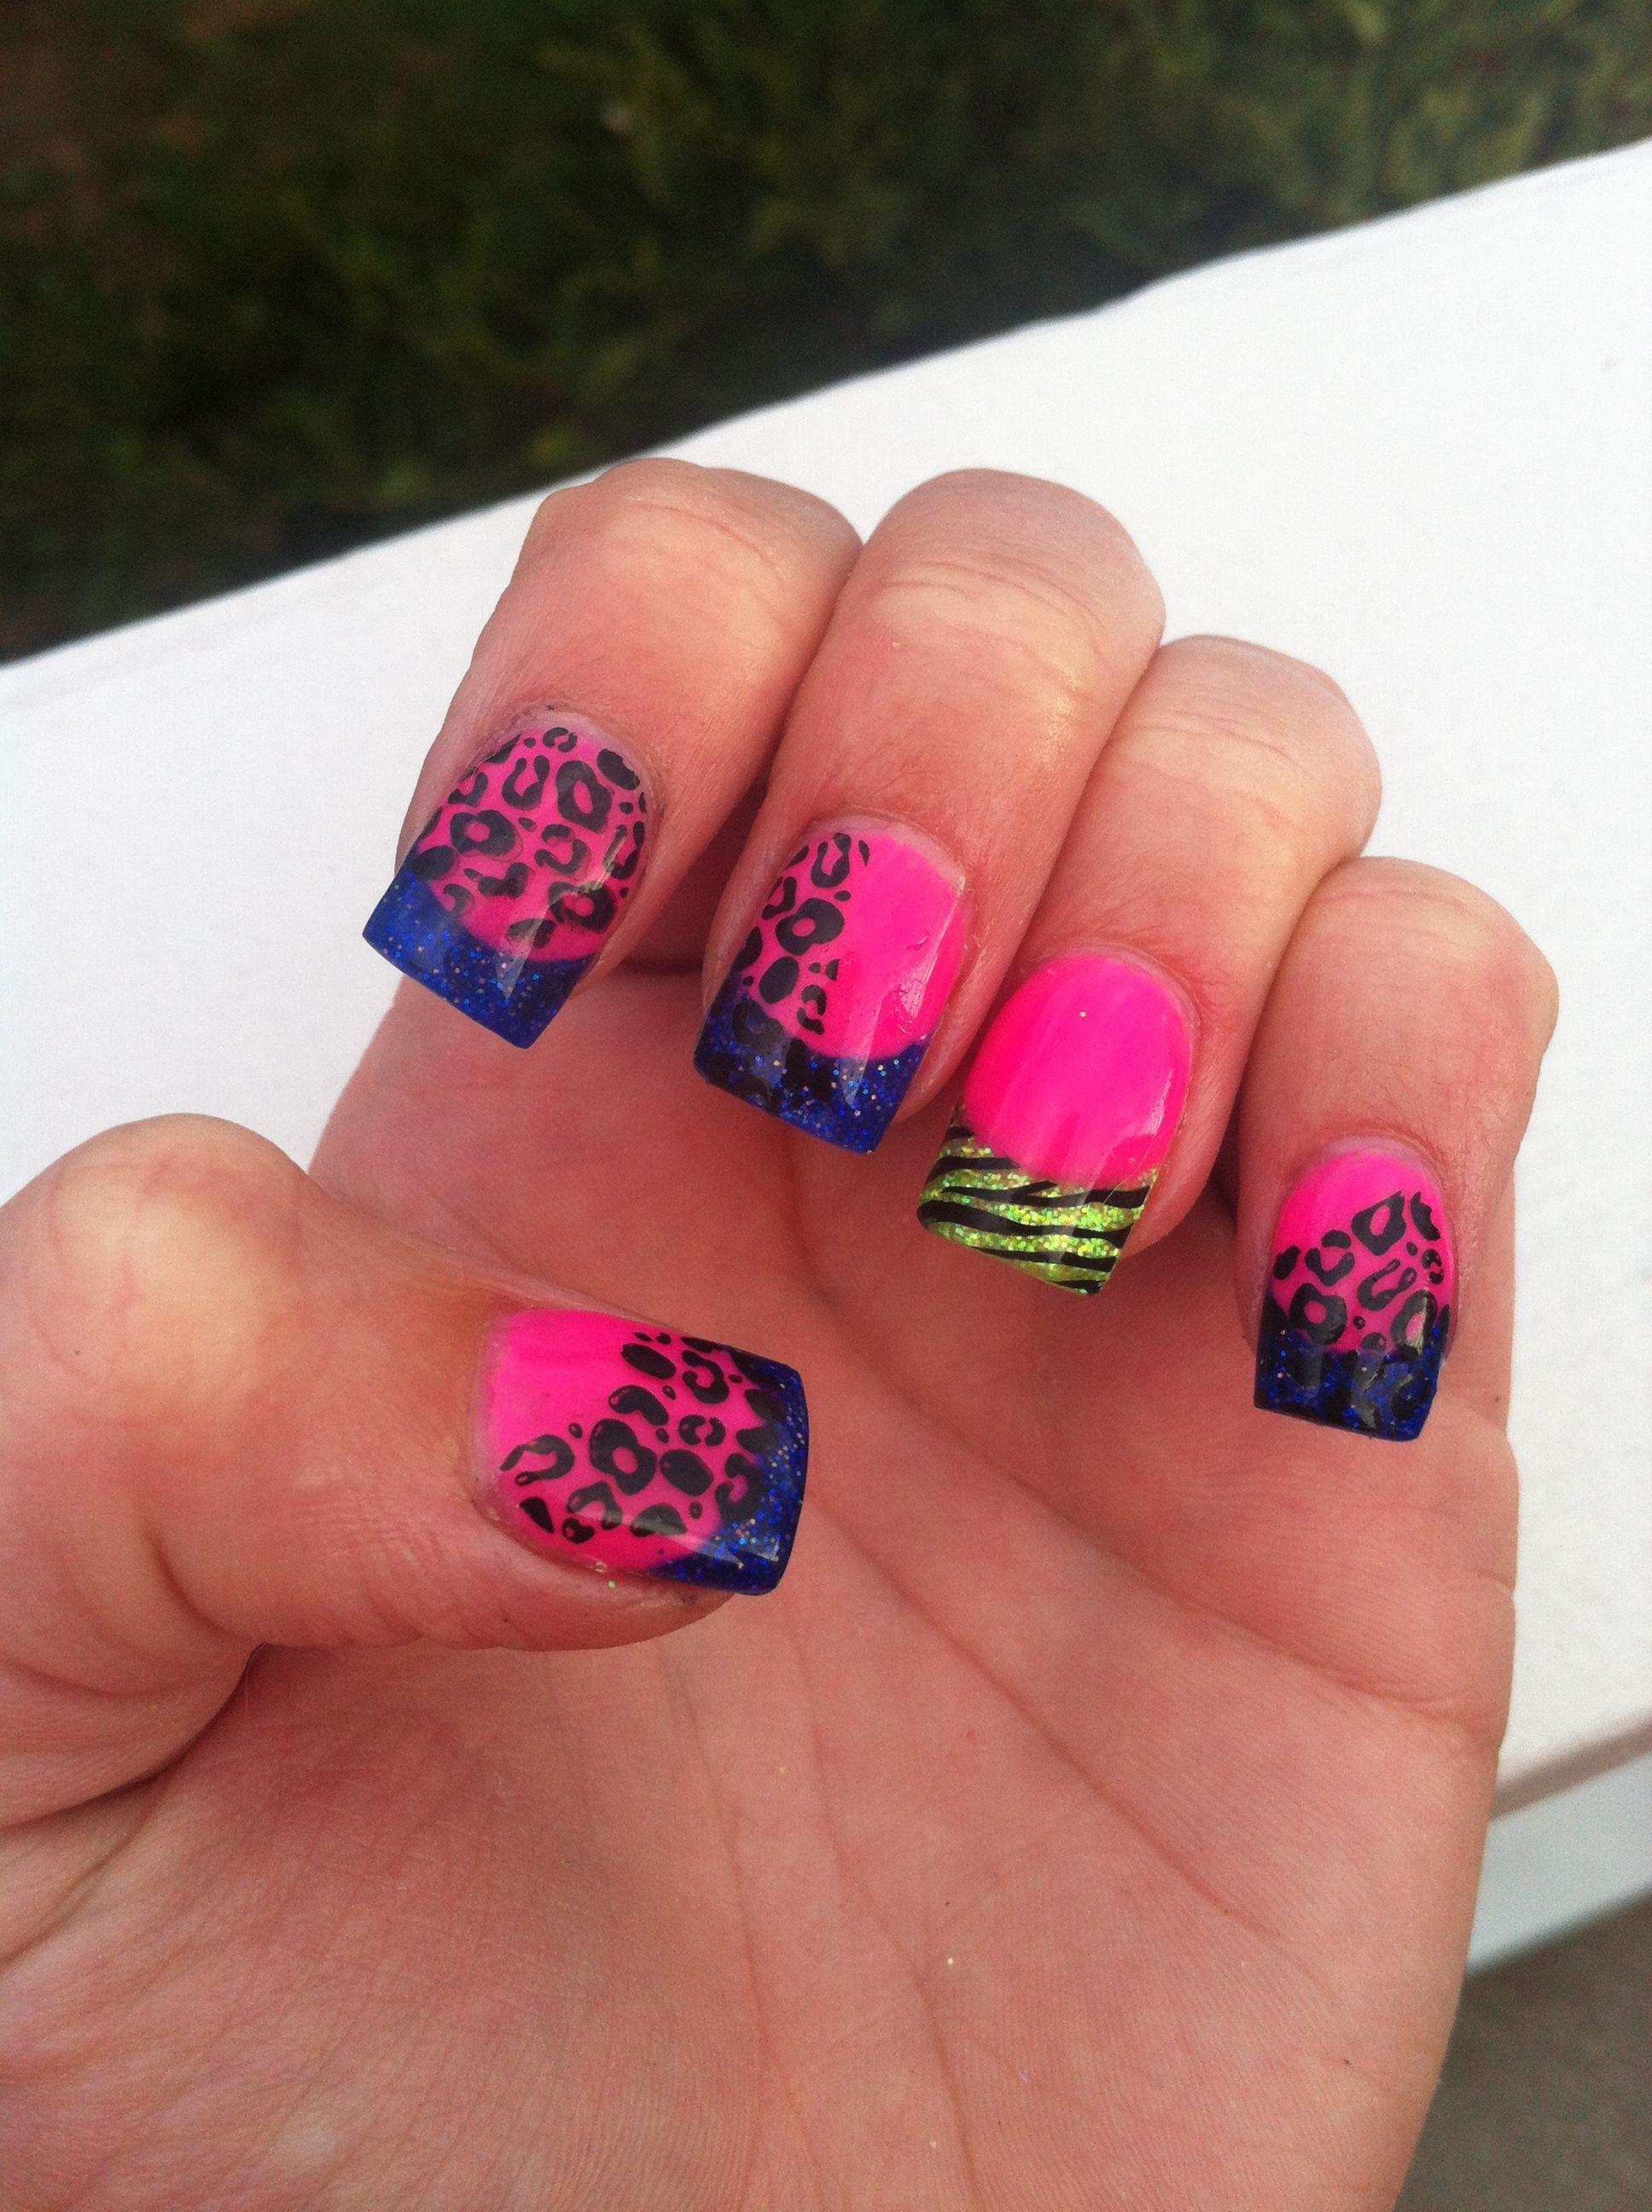 Neon wild acrylic nails | My Nail Art | Pinterest | Gorgeous nails ...